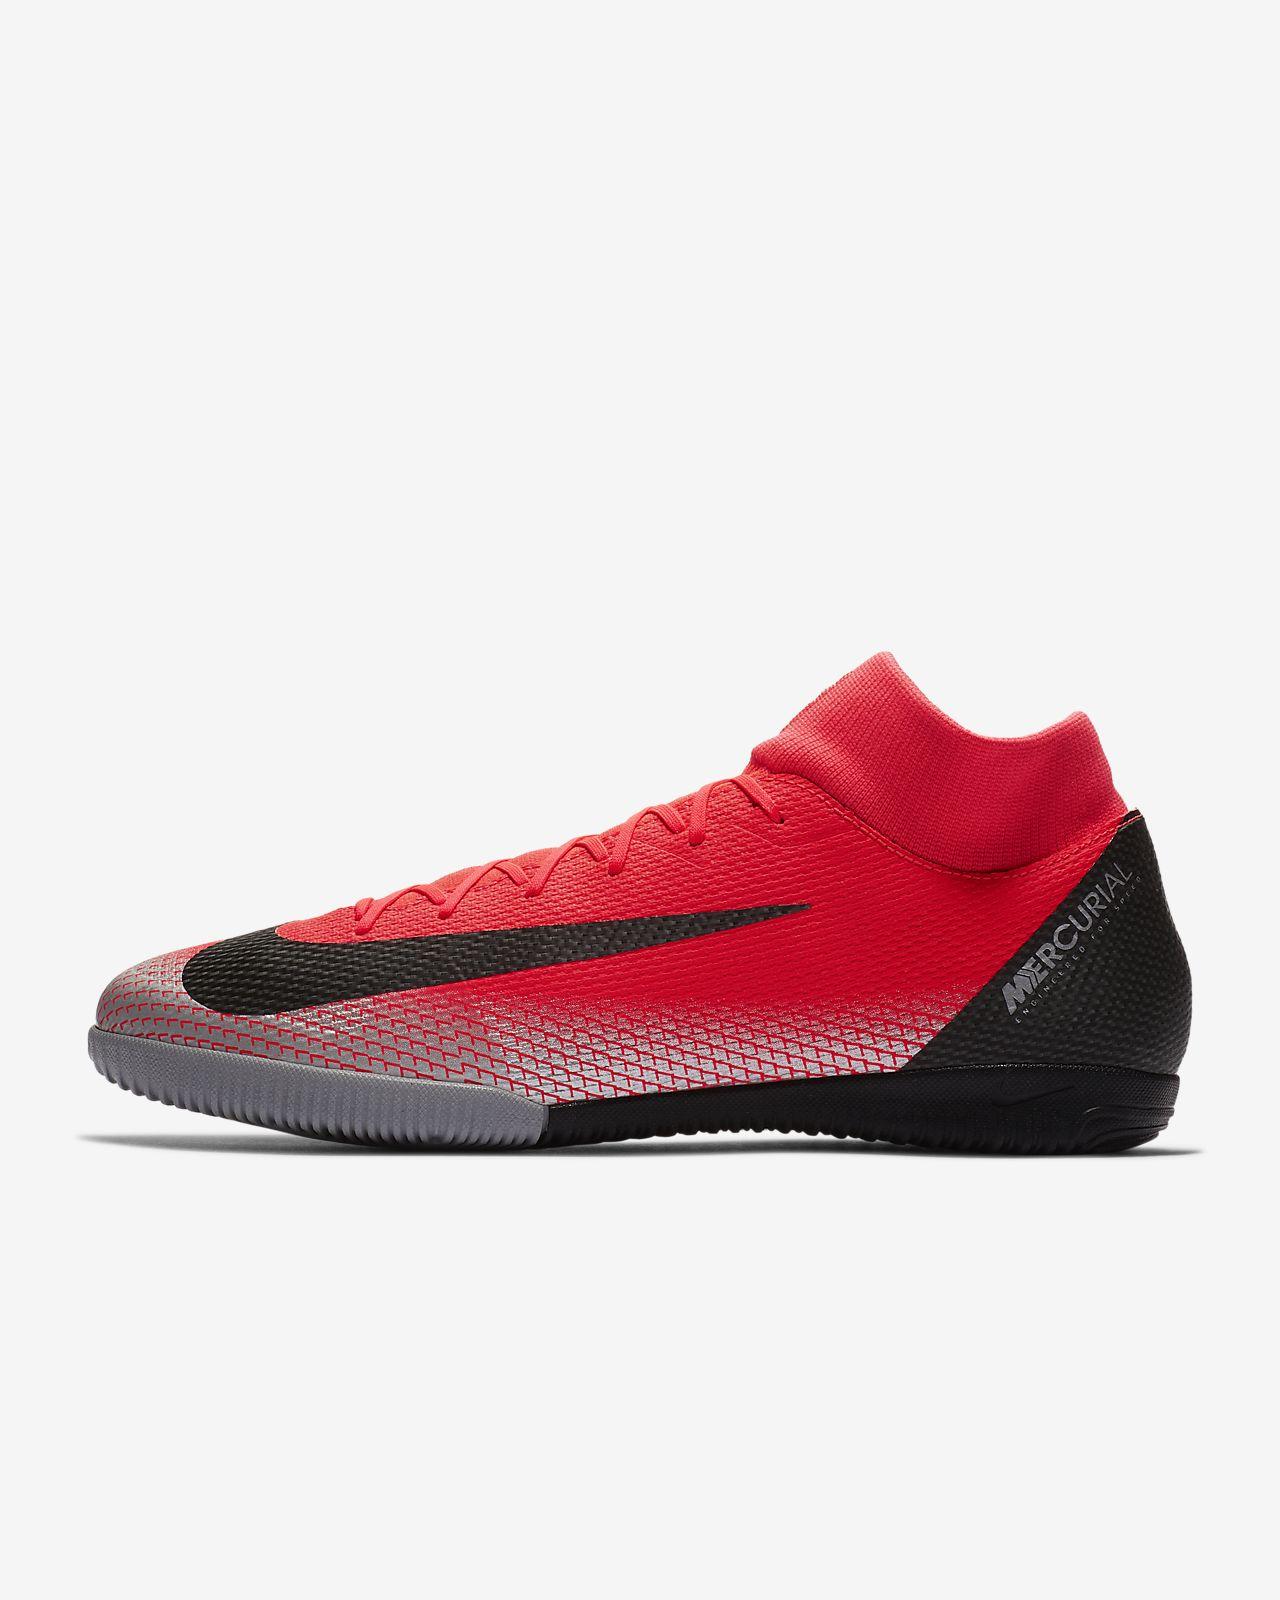 Nike MercurialX Superfly VI Academy CR7 IC Botas de fútbol sala